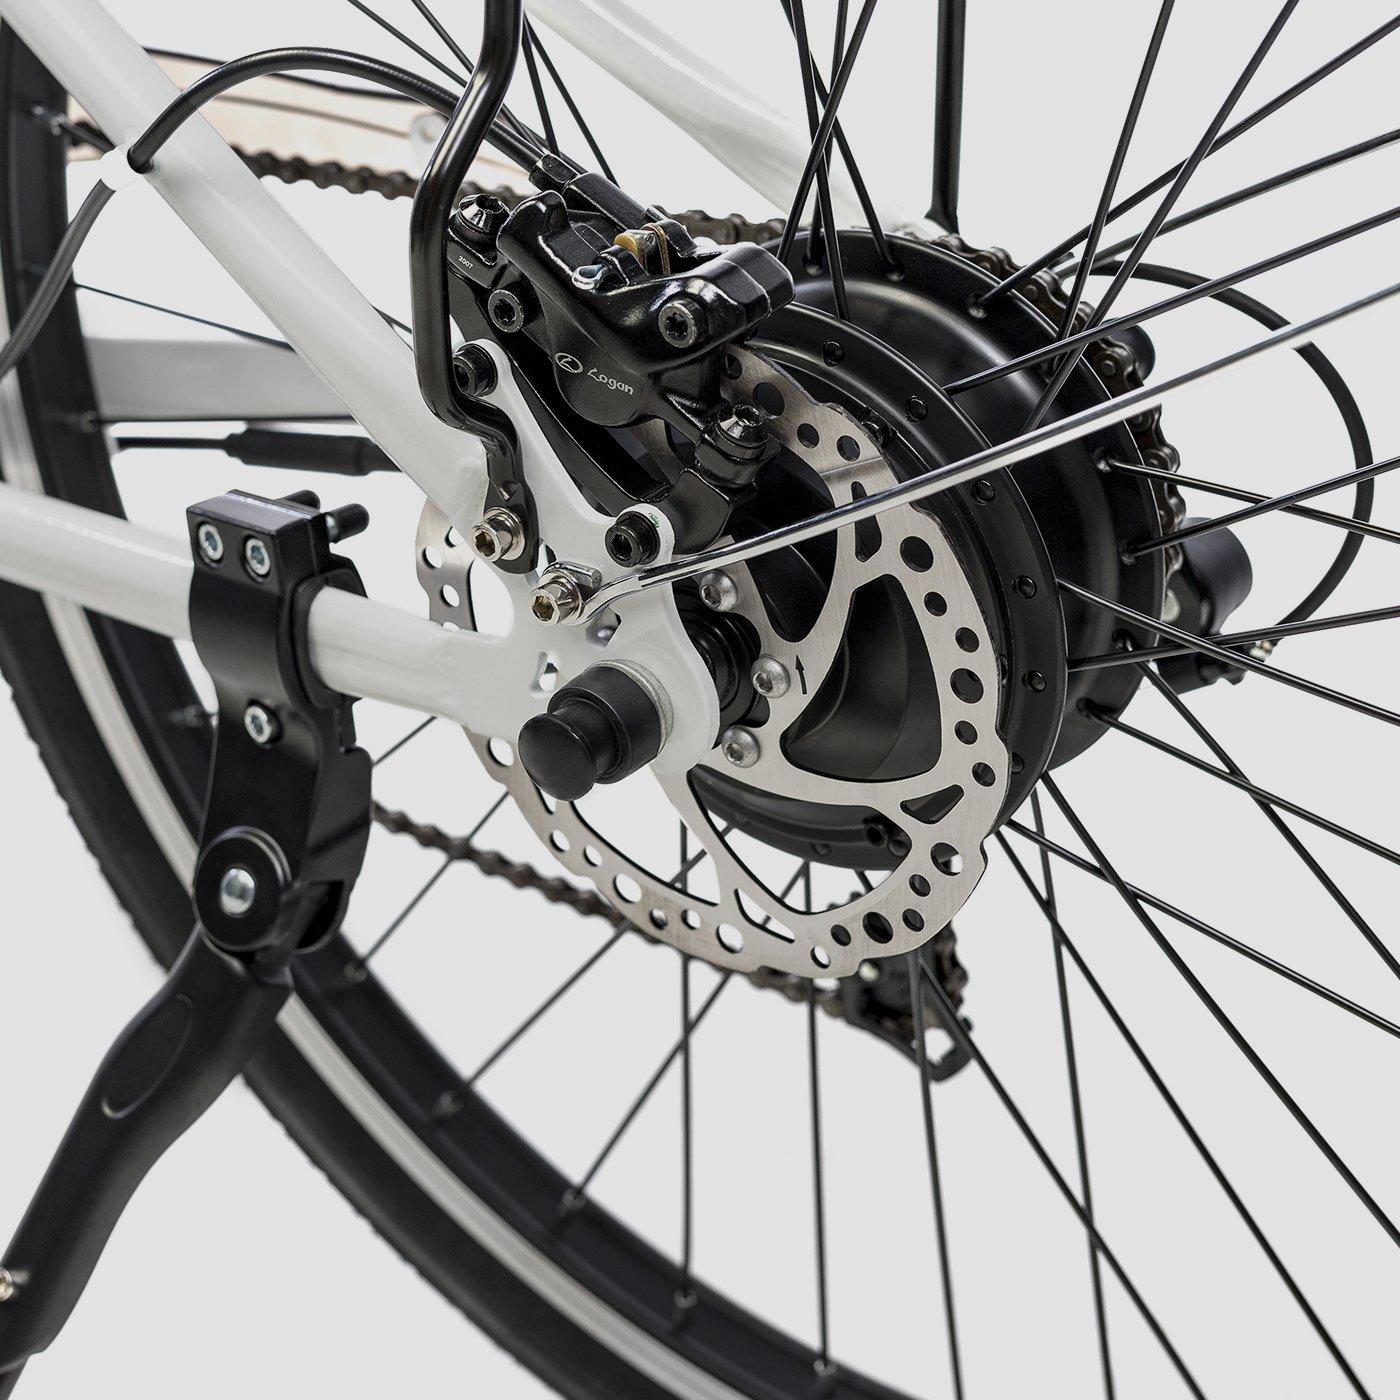 Biwbik Sunray white electric touring bike